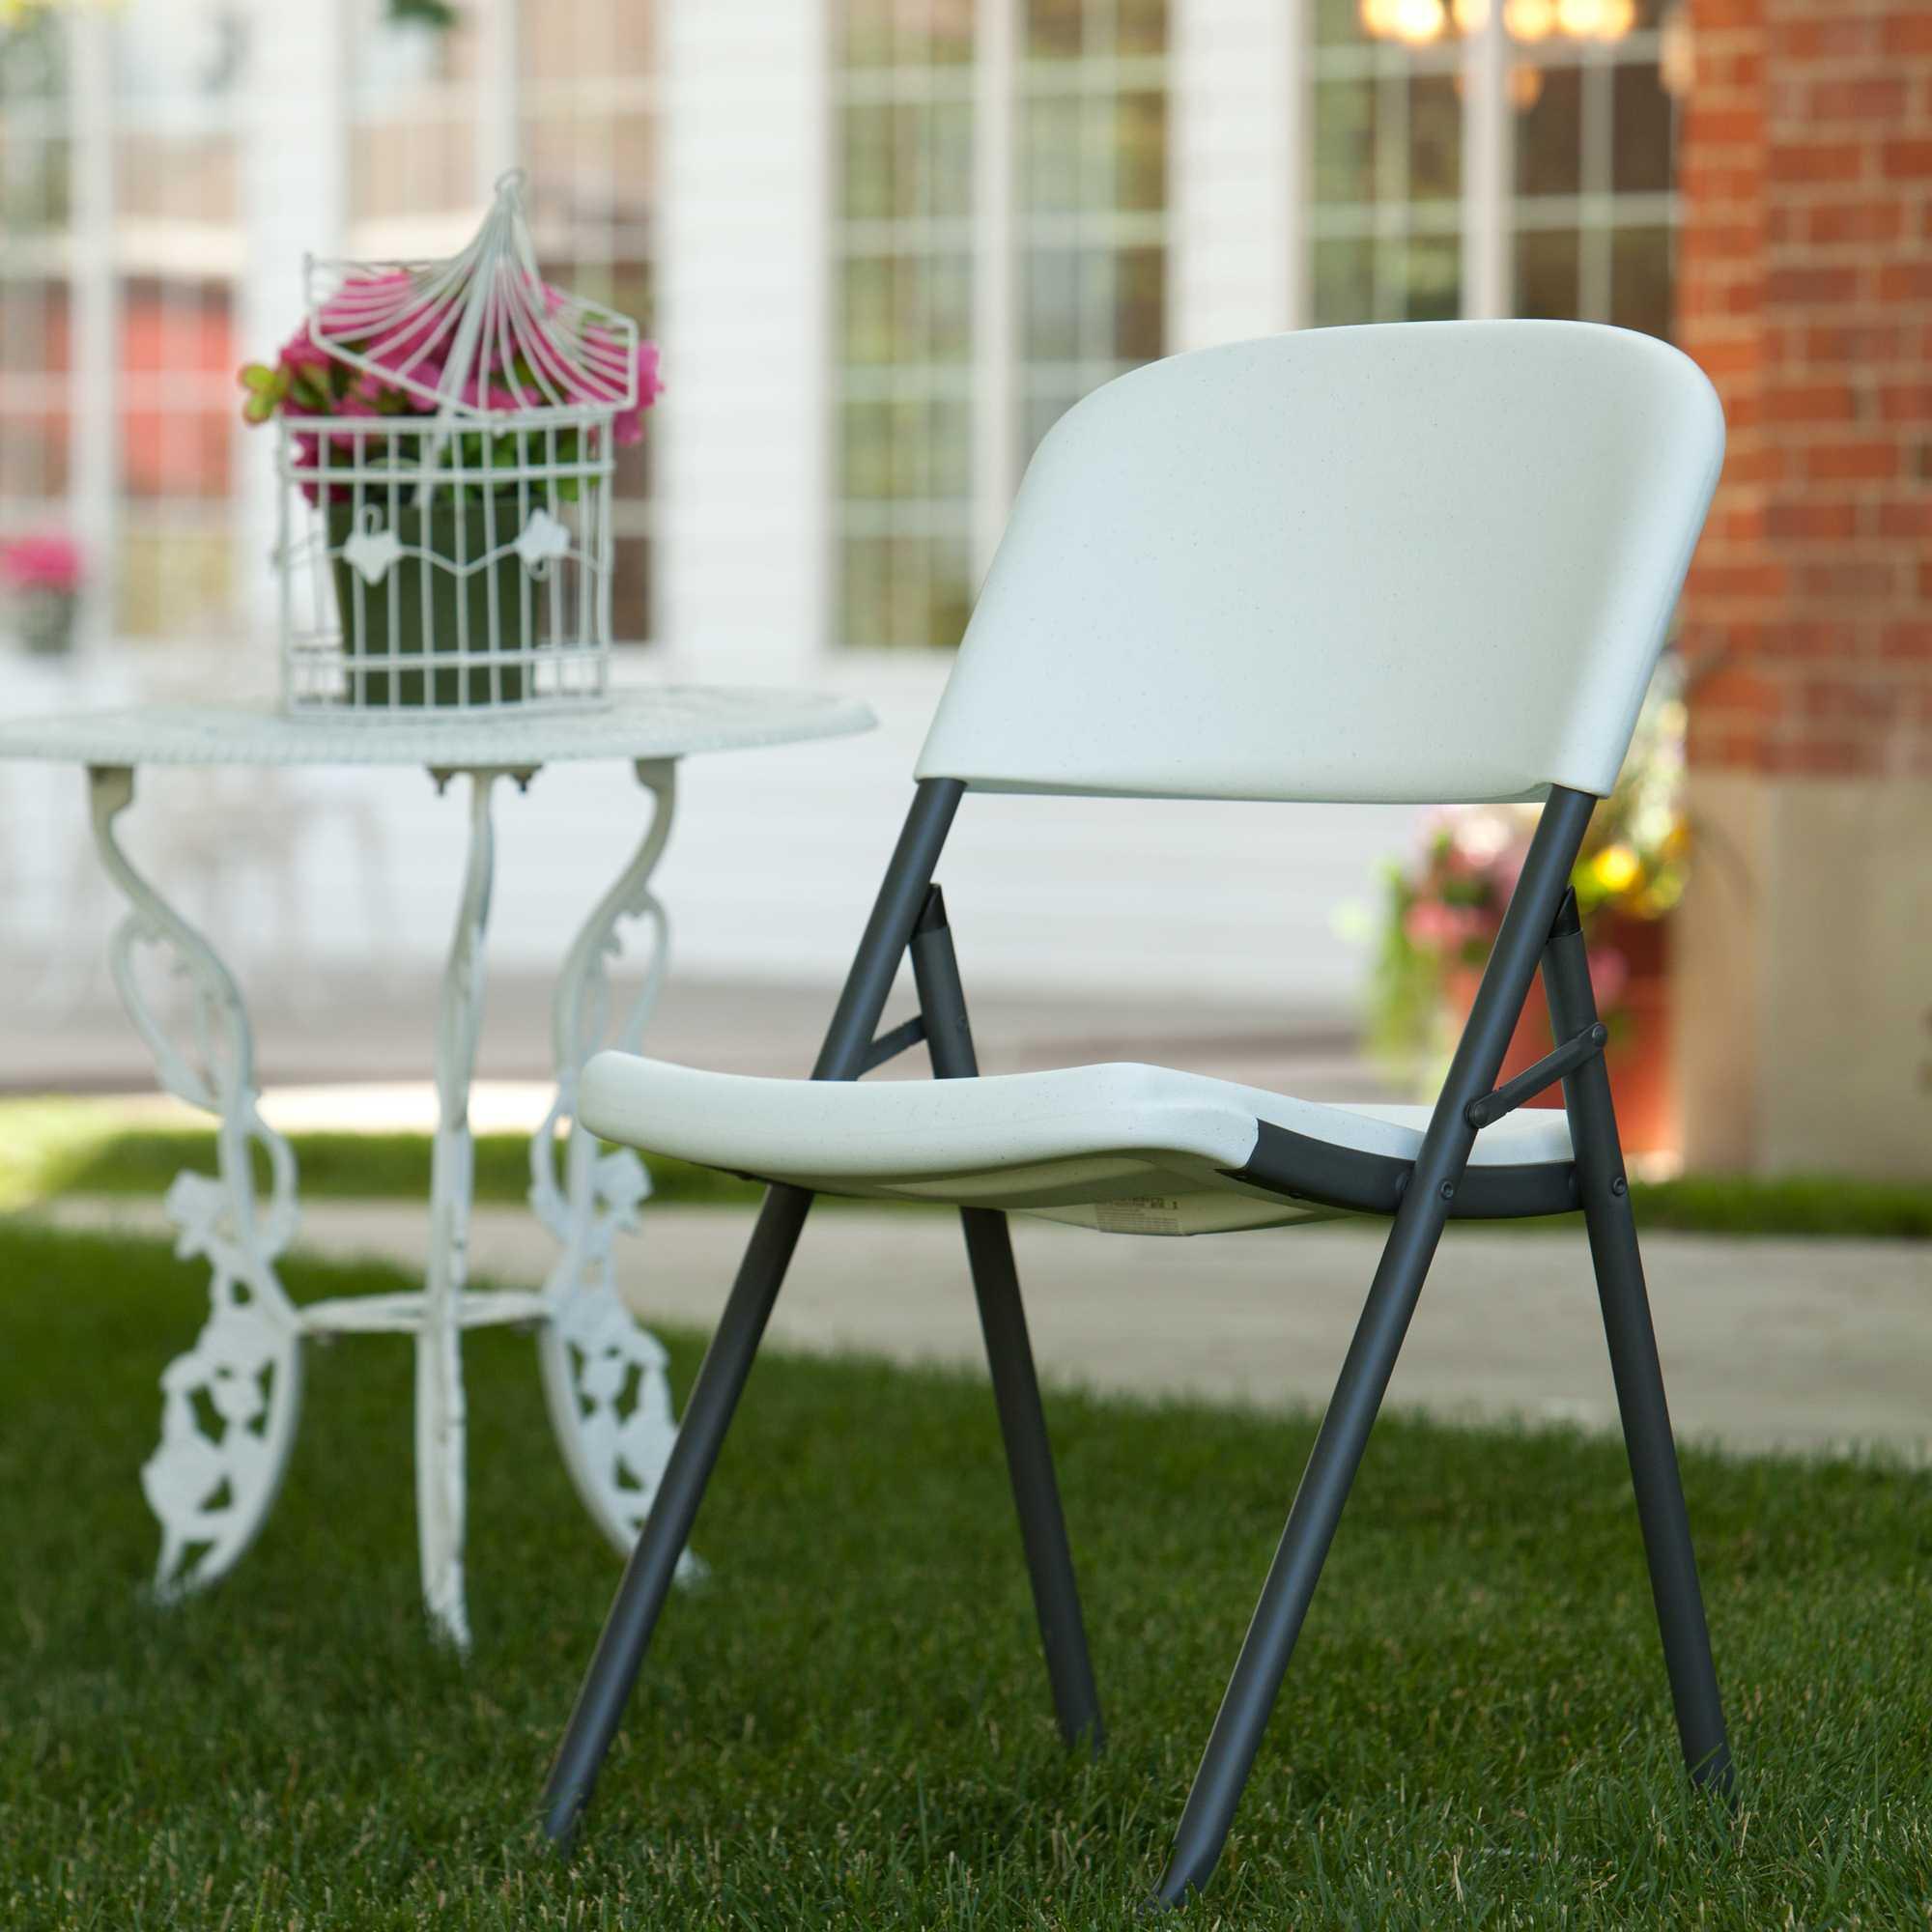 Lifetime Folding Chairs 80155 White Granite Loop Leg